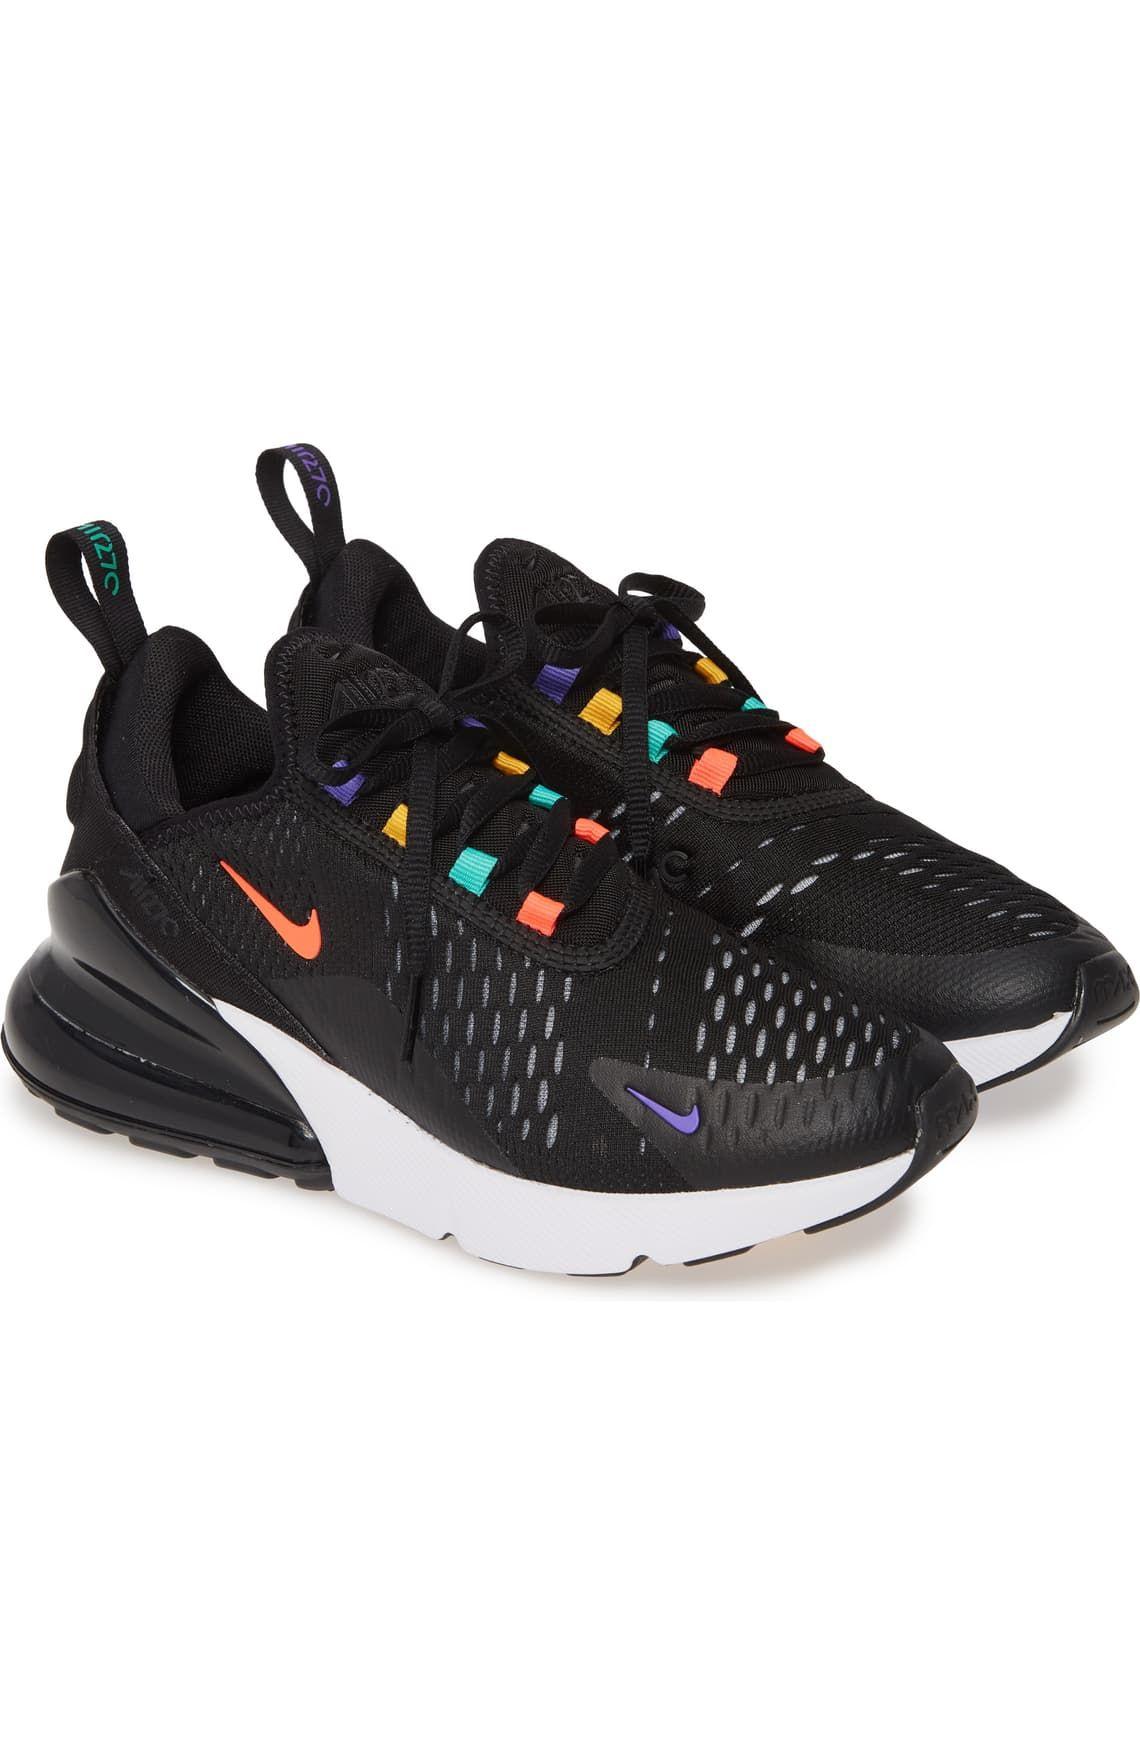 Nike Air Max 270 Premium Sneaker (Women) Nordstrom (With